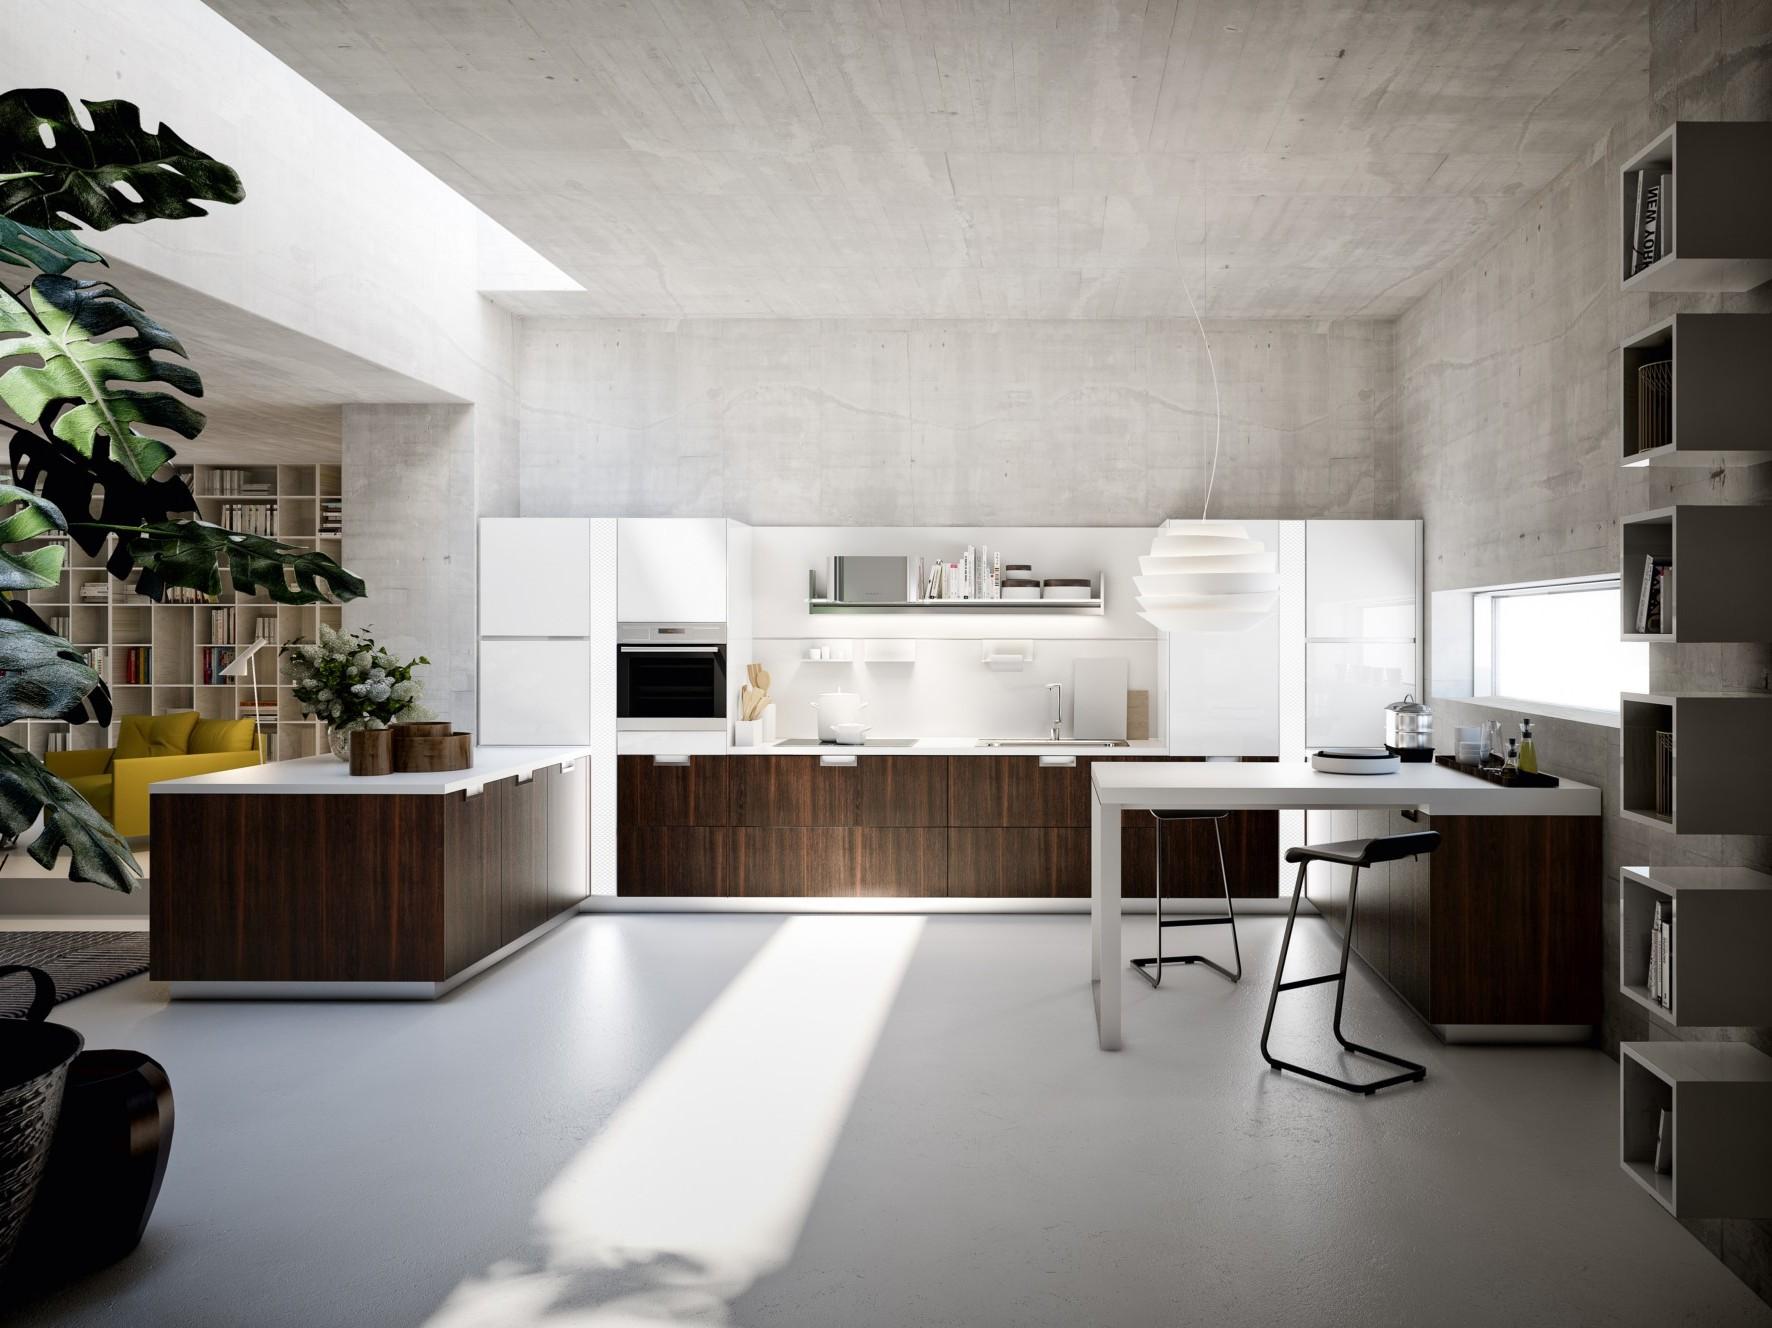 Cuisine Italienne Design Luxe